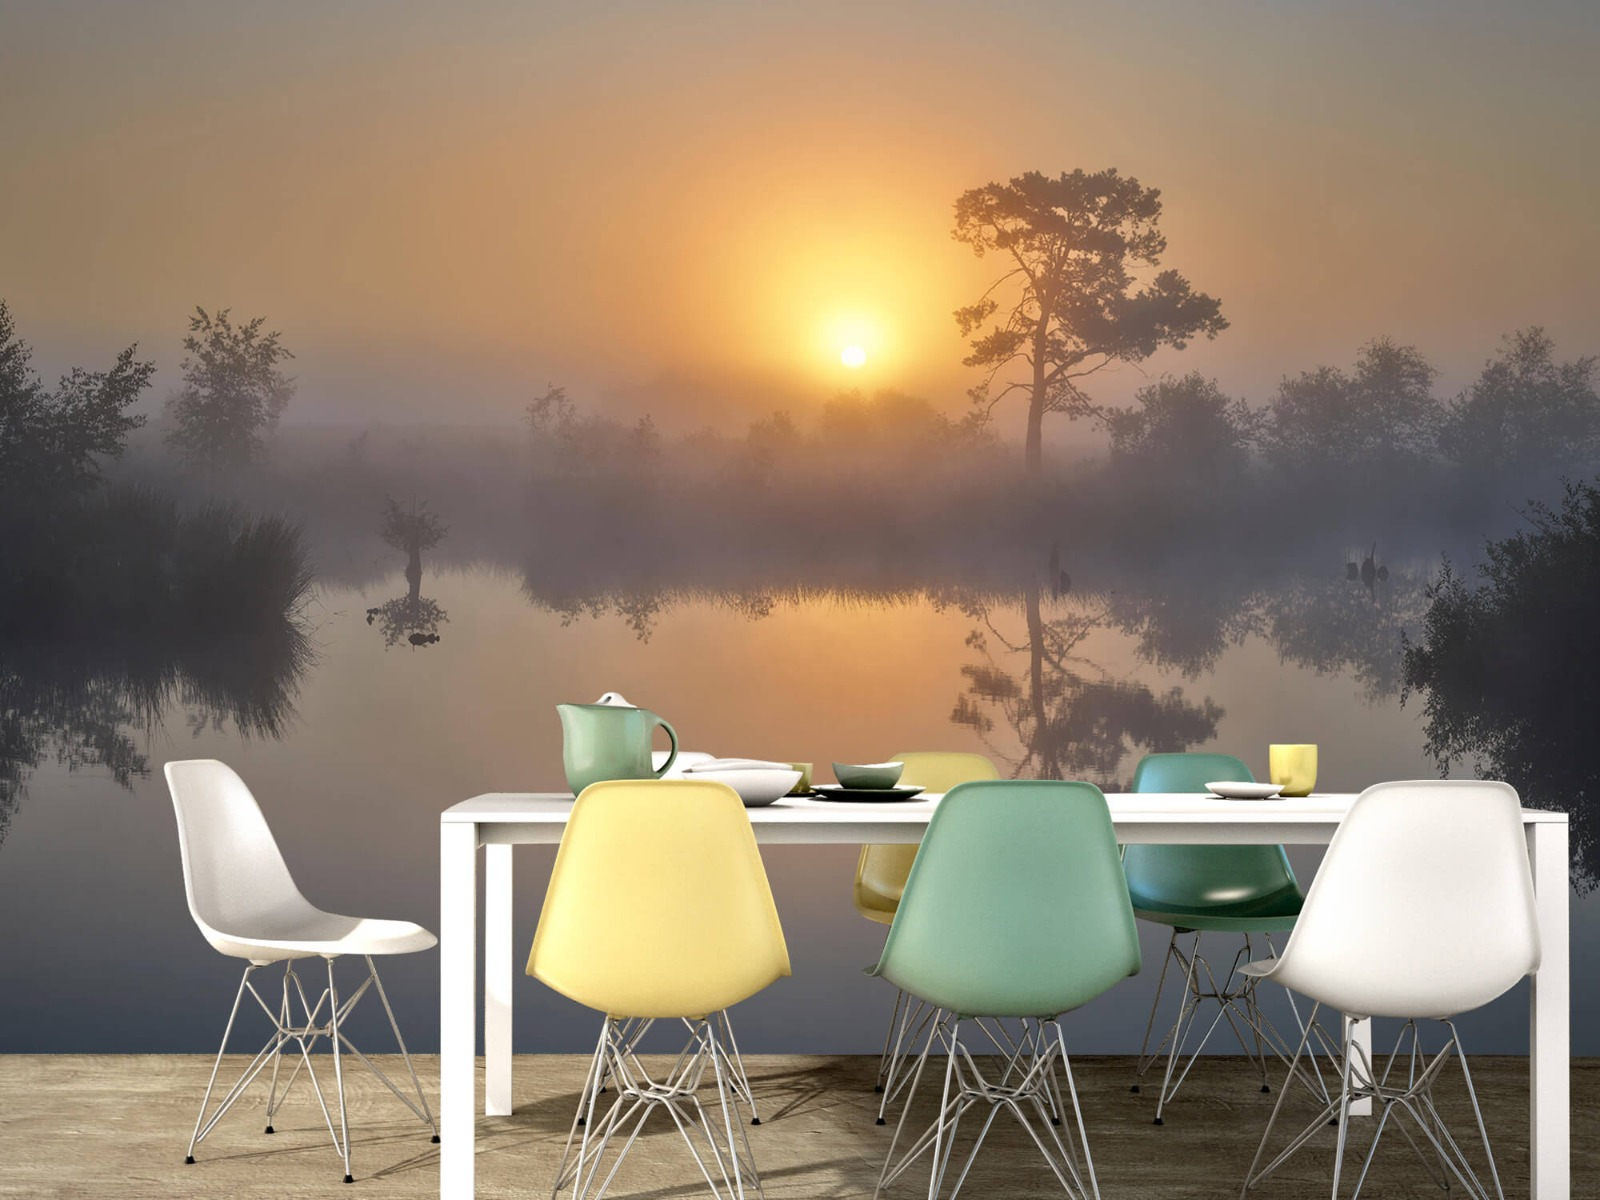 Natuur - Mistige zonsopkomst 16